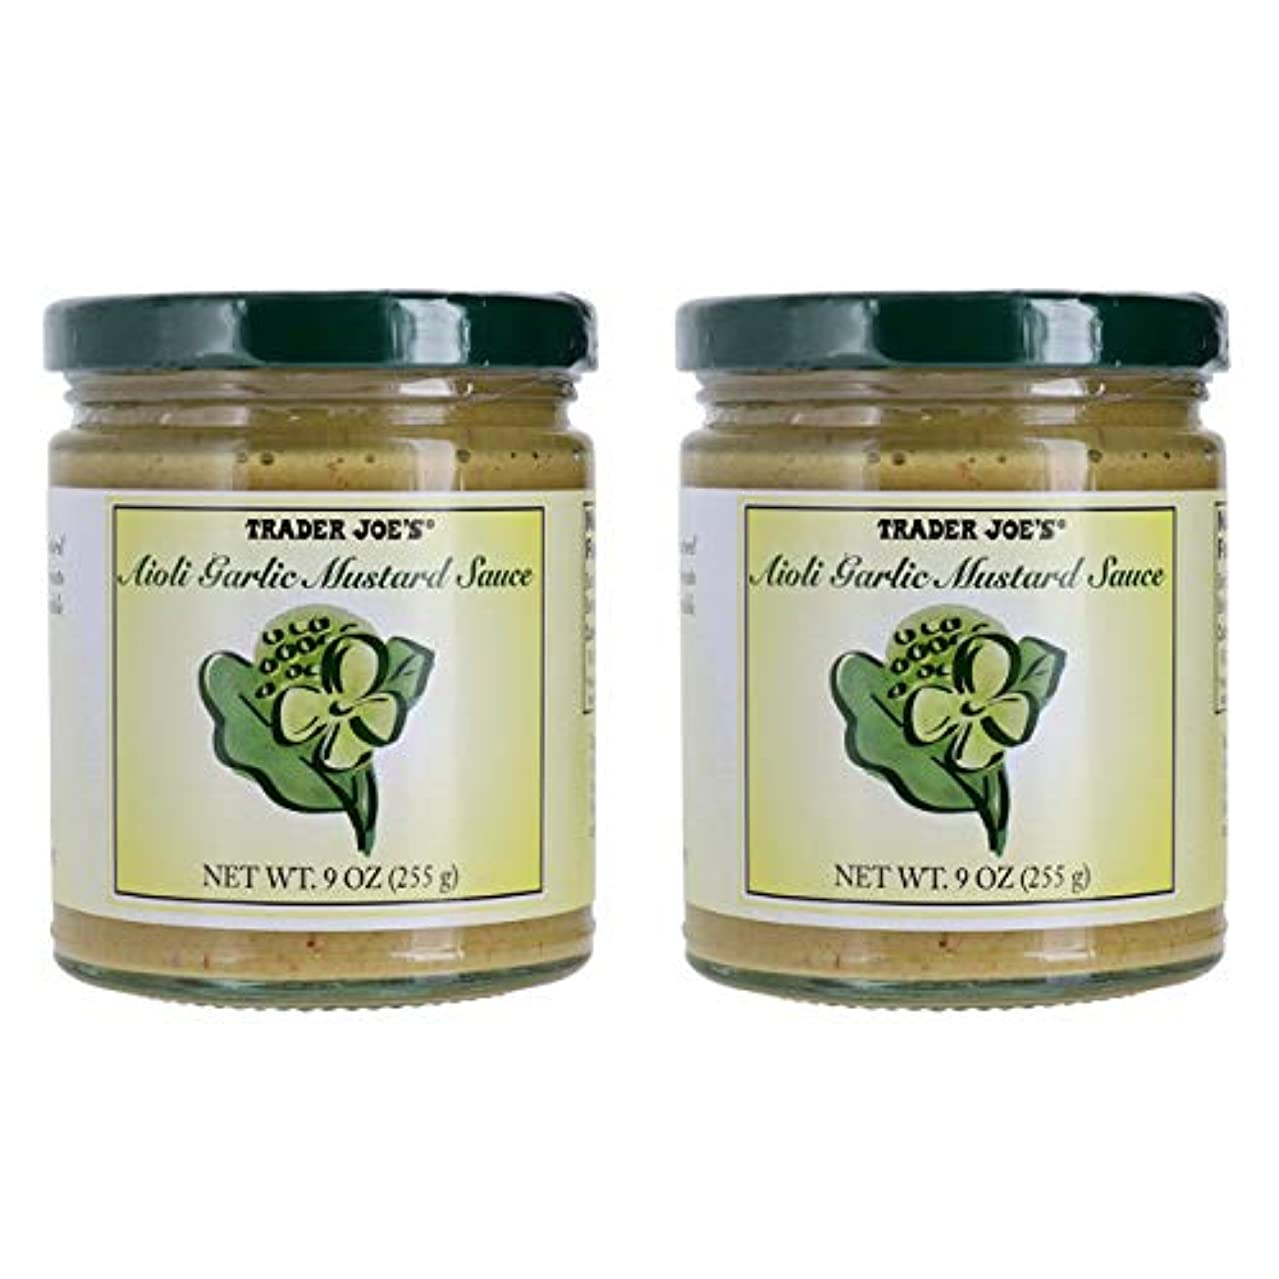 Trader Joe's Aioli Garlic Mustard Sauce Bundle (2 Pack)